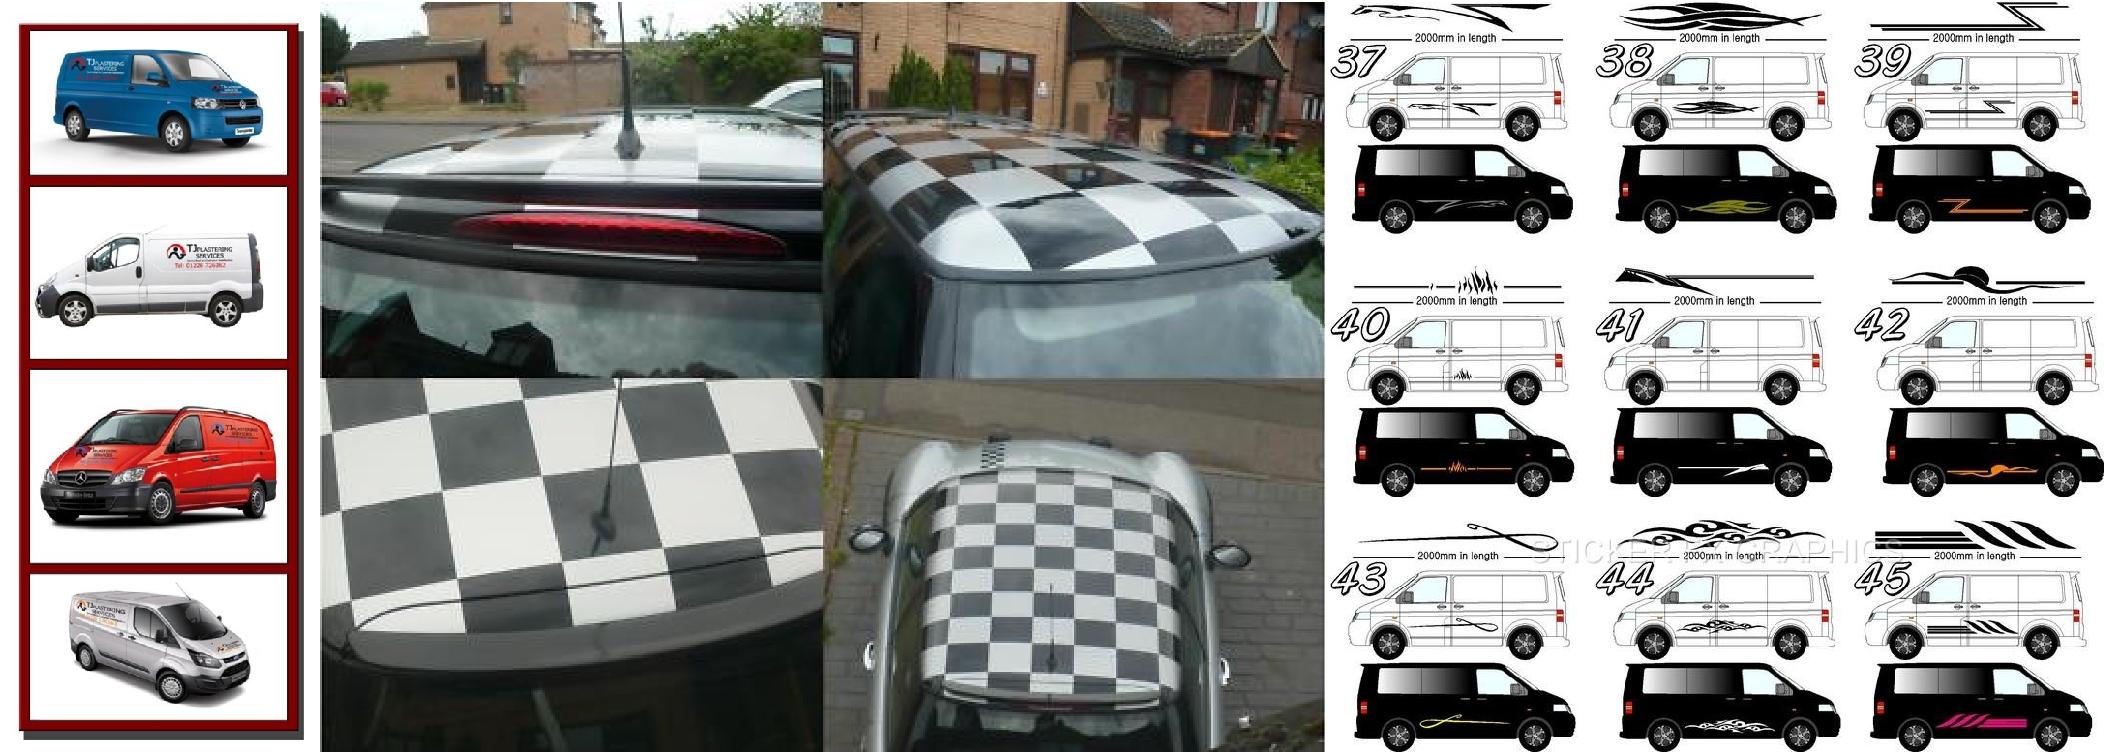 sunstrips subaru vw corsa astra saxo focus ford tous v hicules voiture et vans ebay. Black Bedroom Furniture Sets. Home Design Ideas